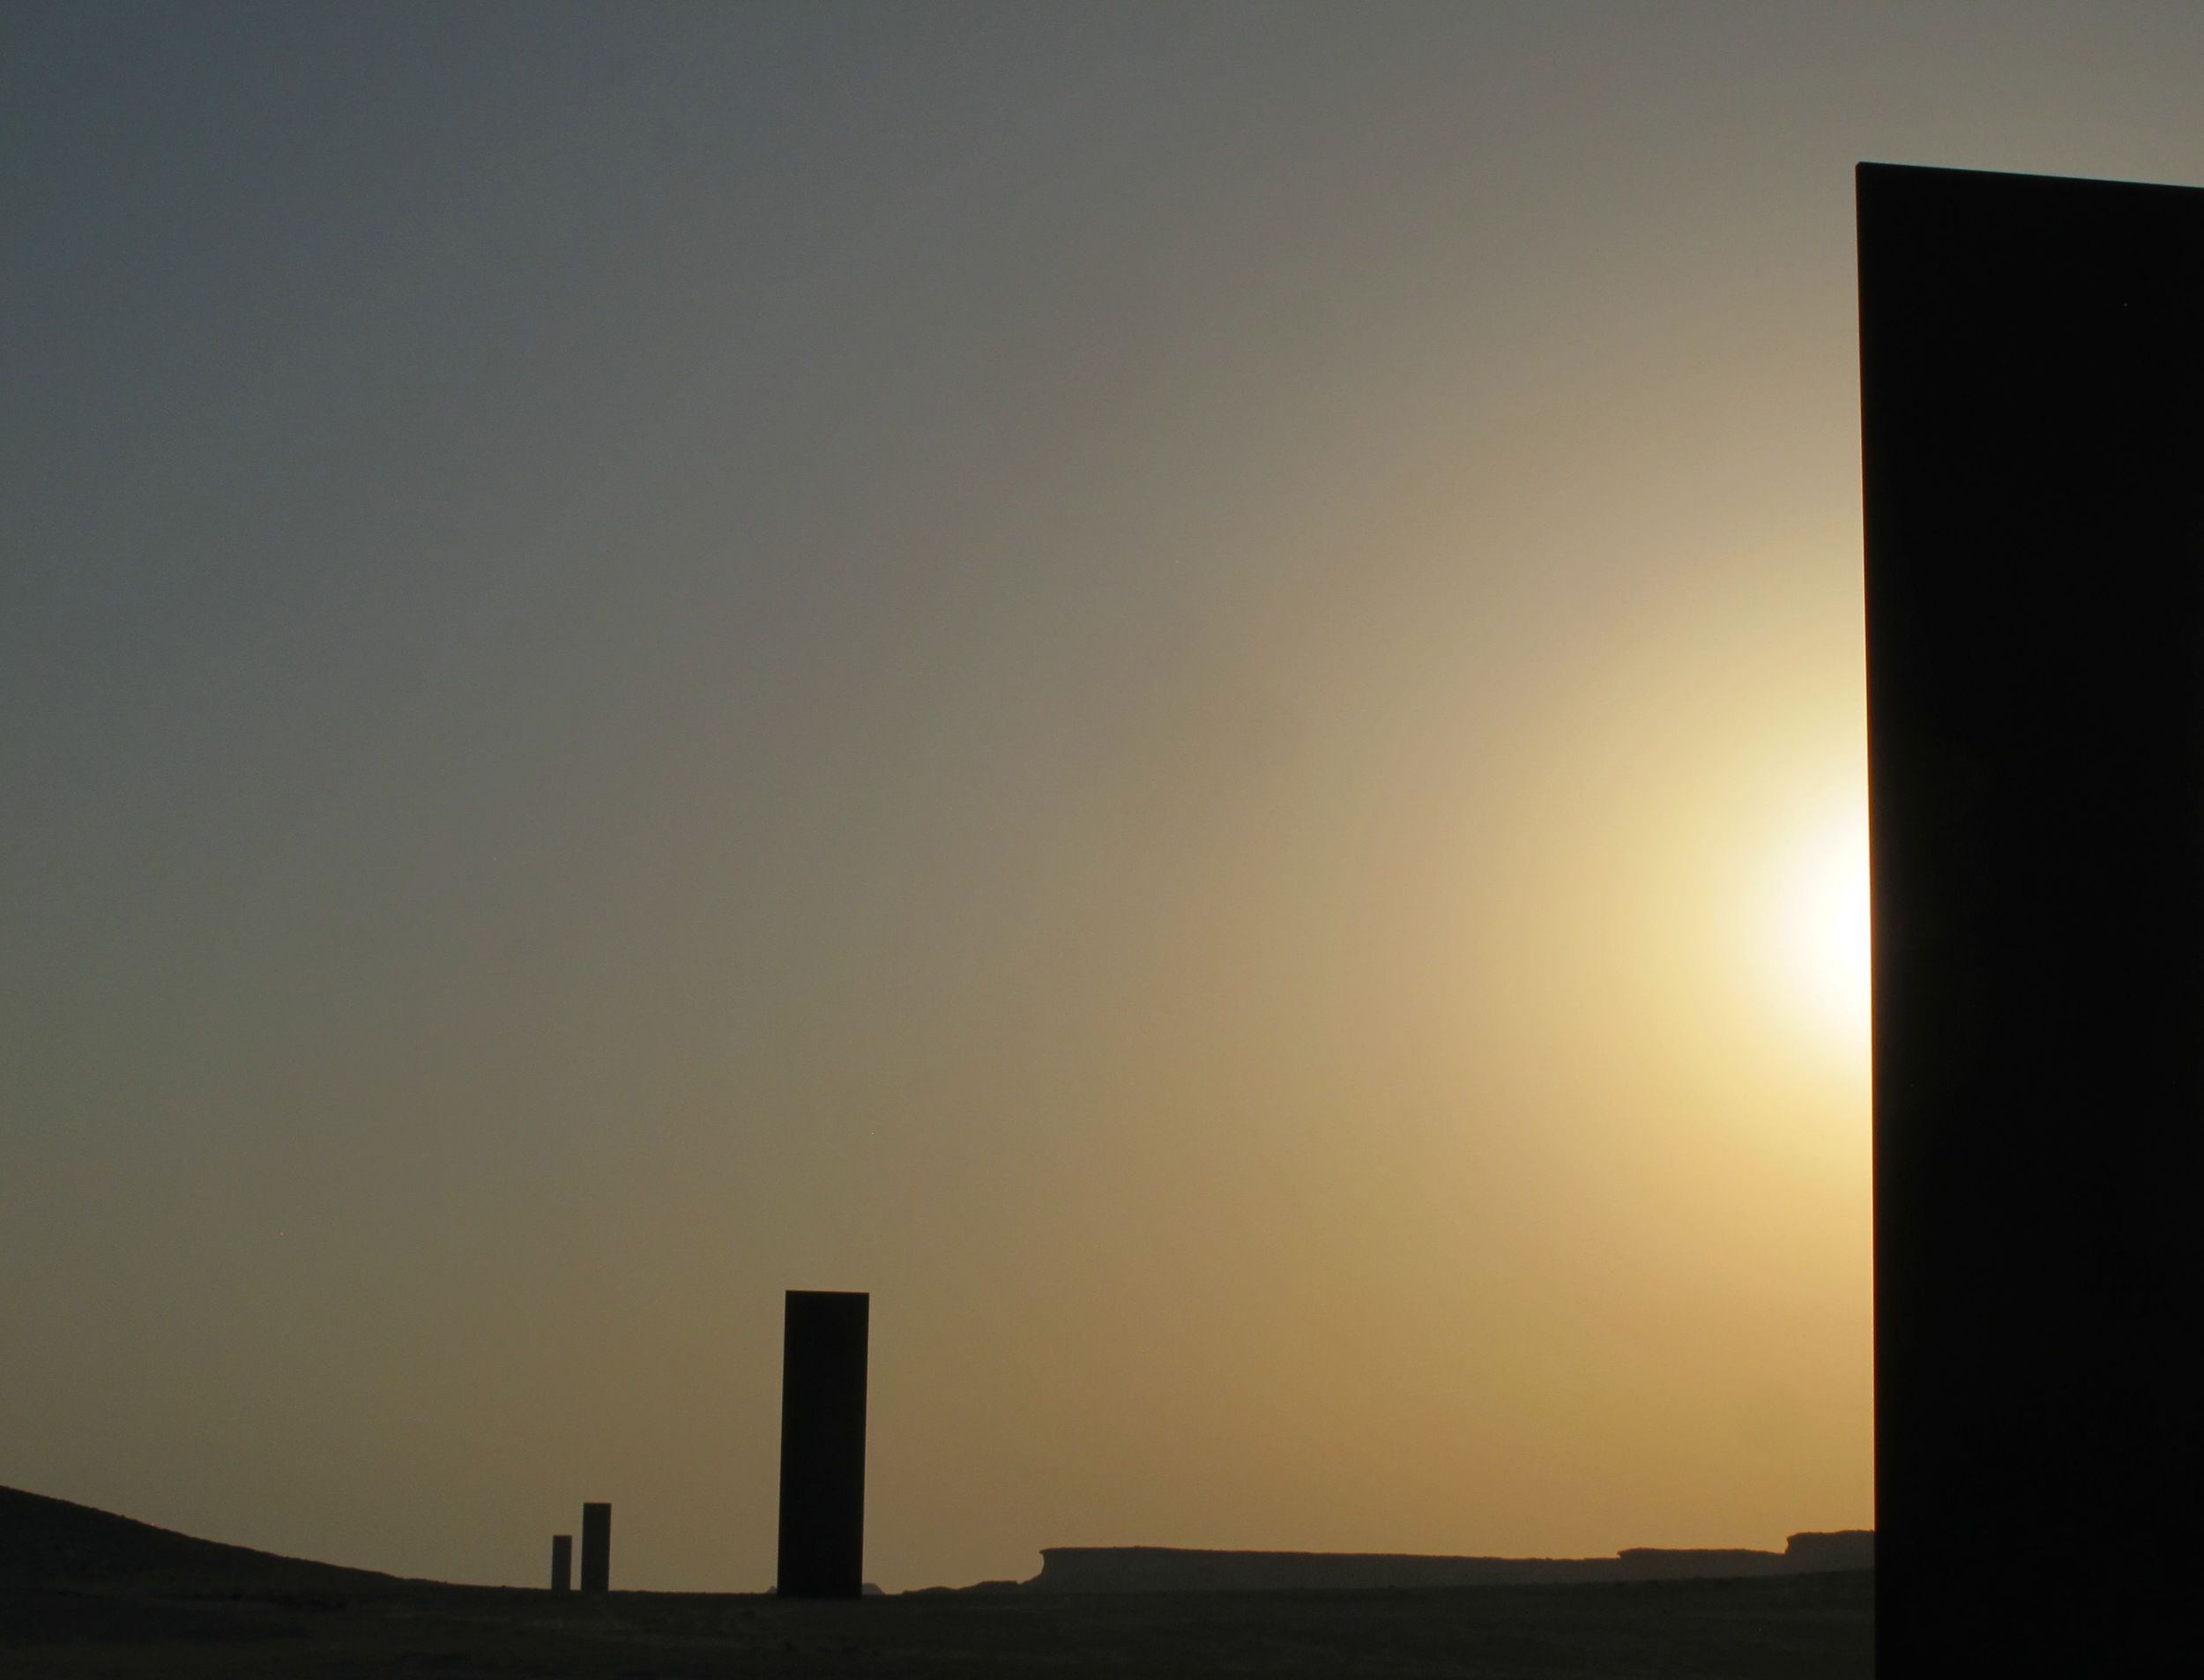 East-West/West-East by Richard Serra